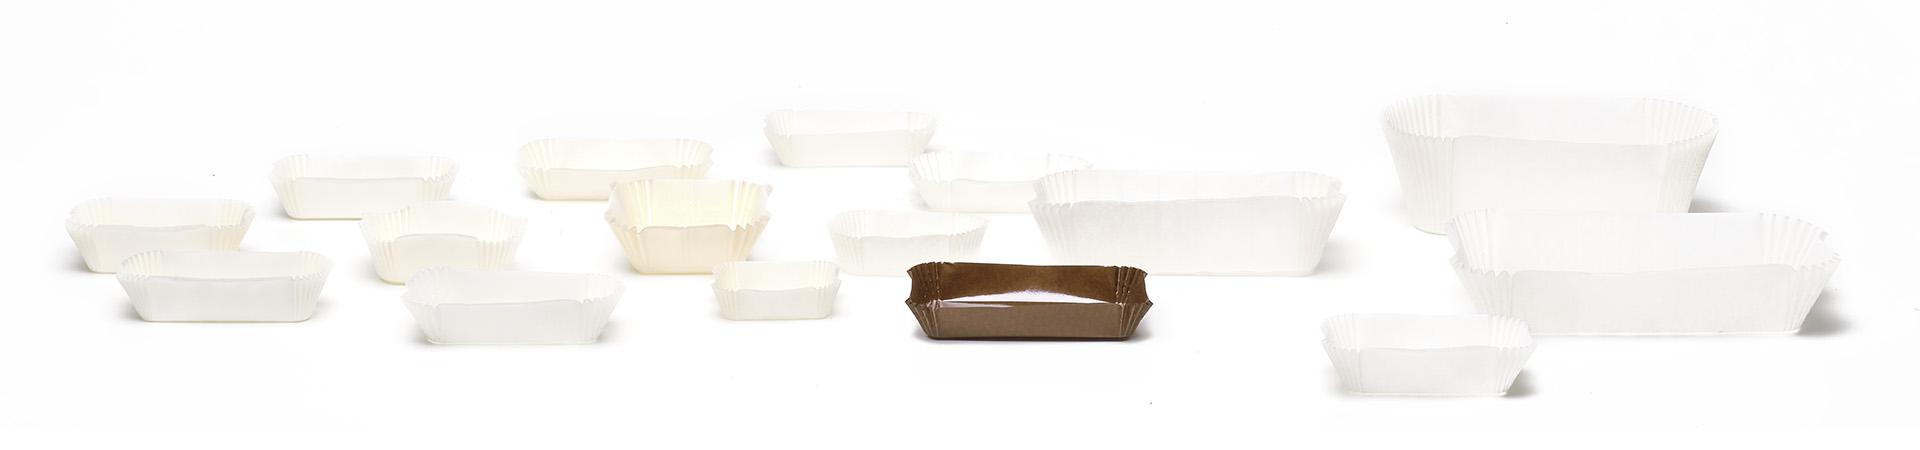 Novacart Rectangular Baking Cups Series